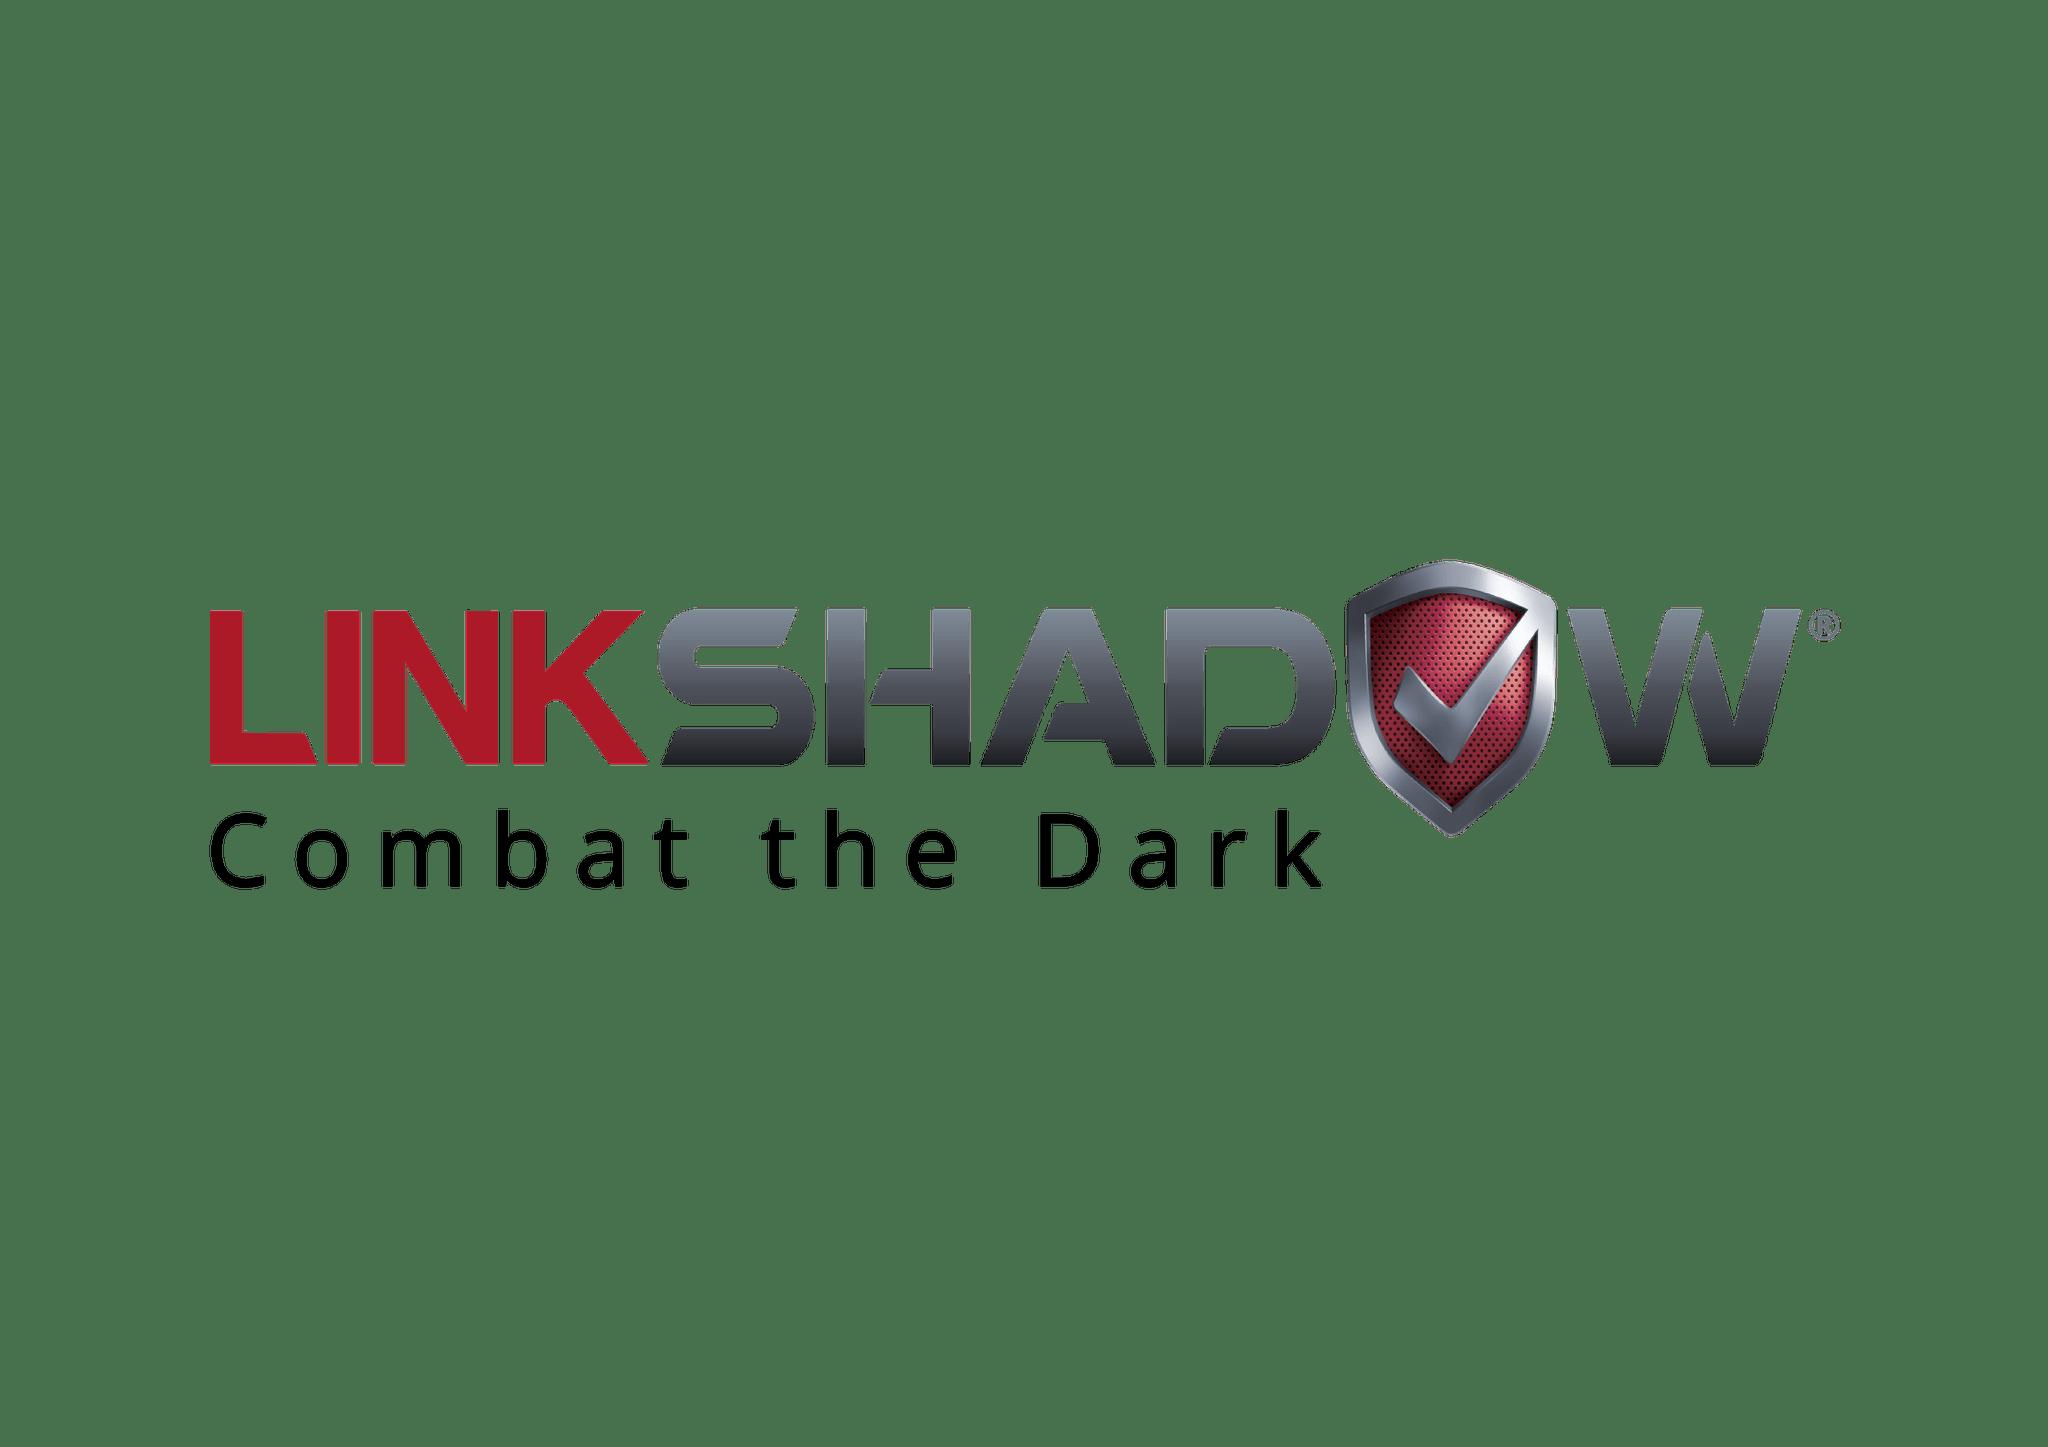 SL LinkShadow